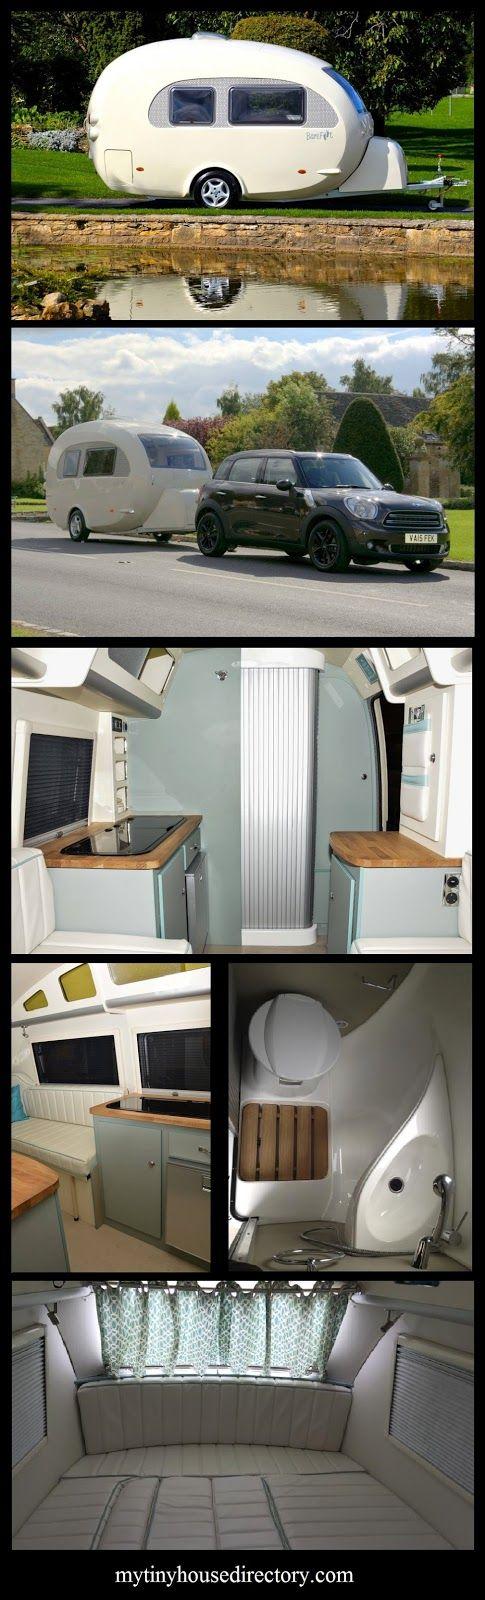 mytinyhousedirectory: Barefoot Caravan ~ We love it!